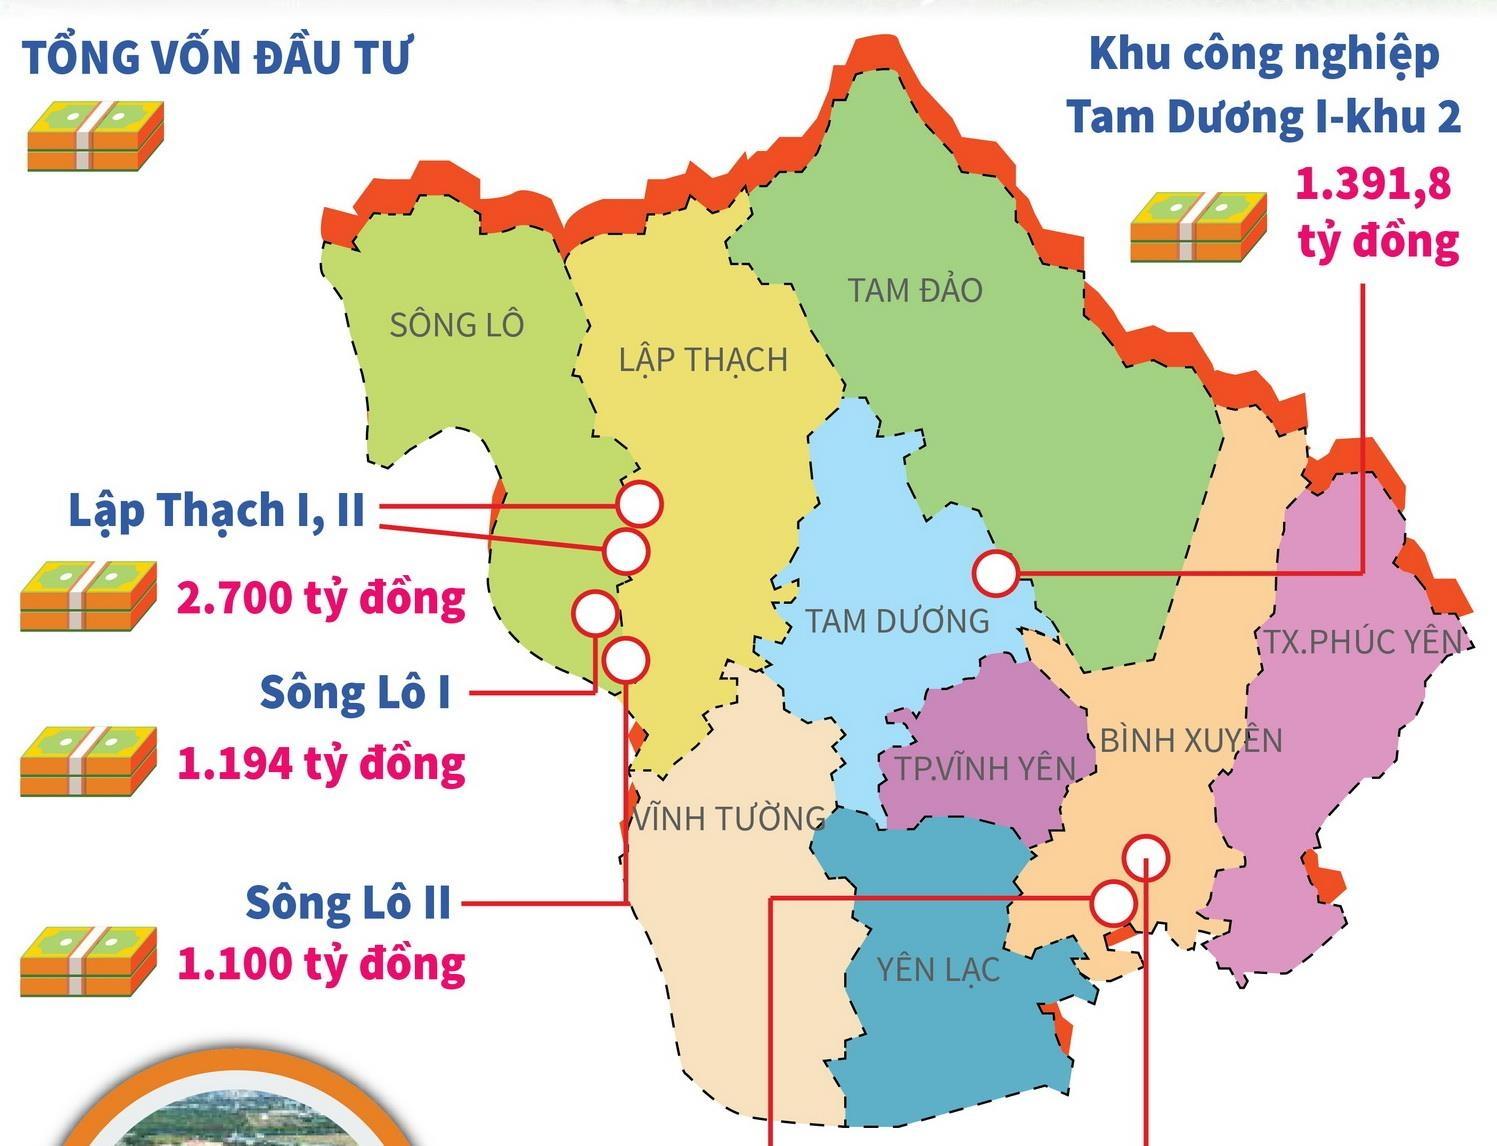 vinh phuc huong den muc tieu tinh cong nghiep theo huong hien dai